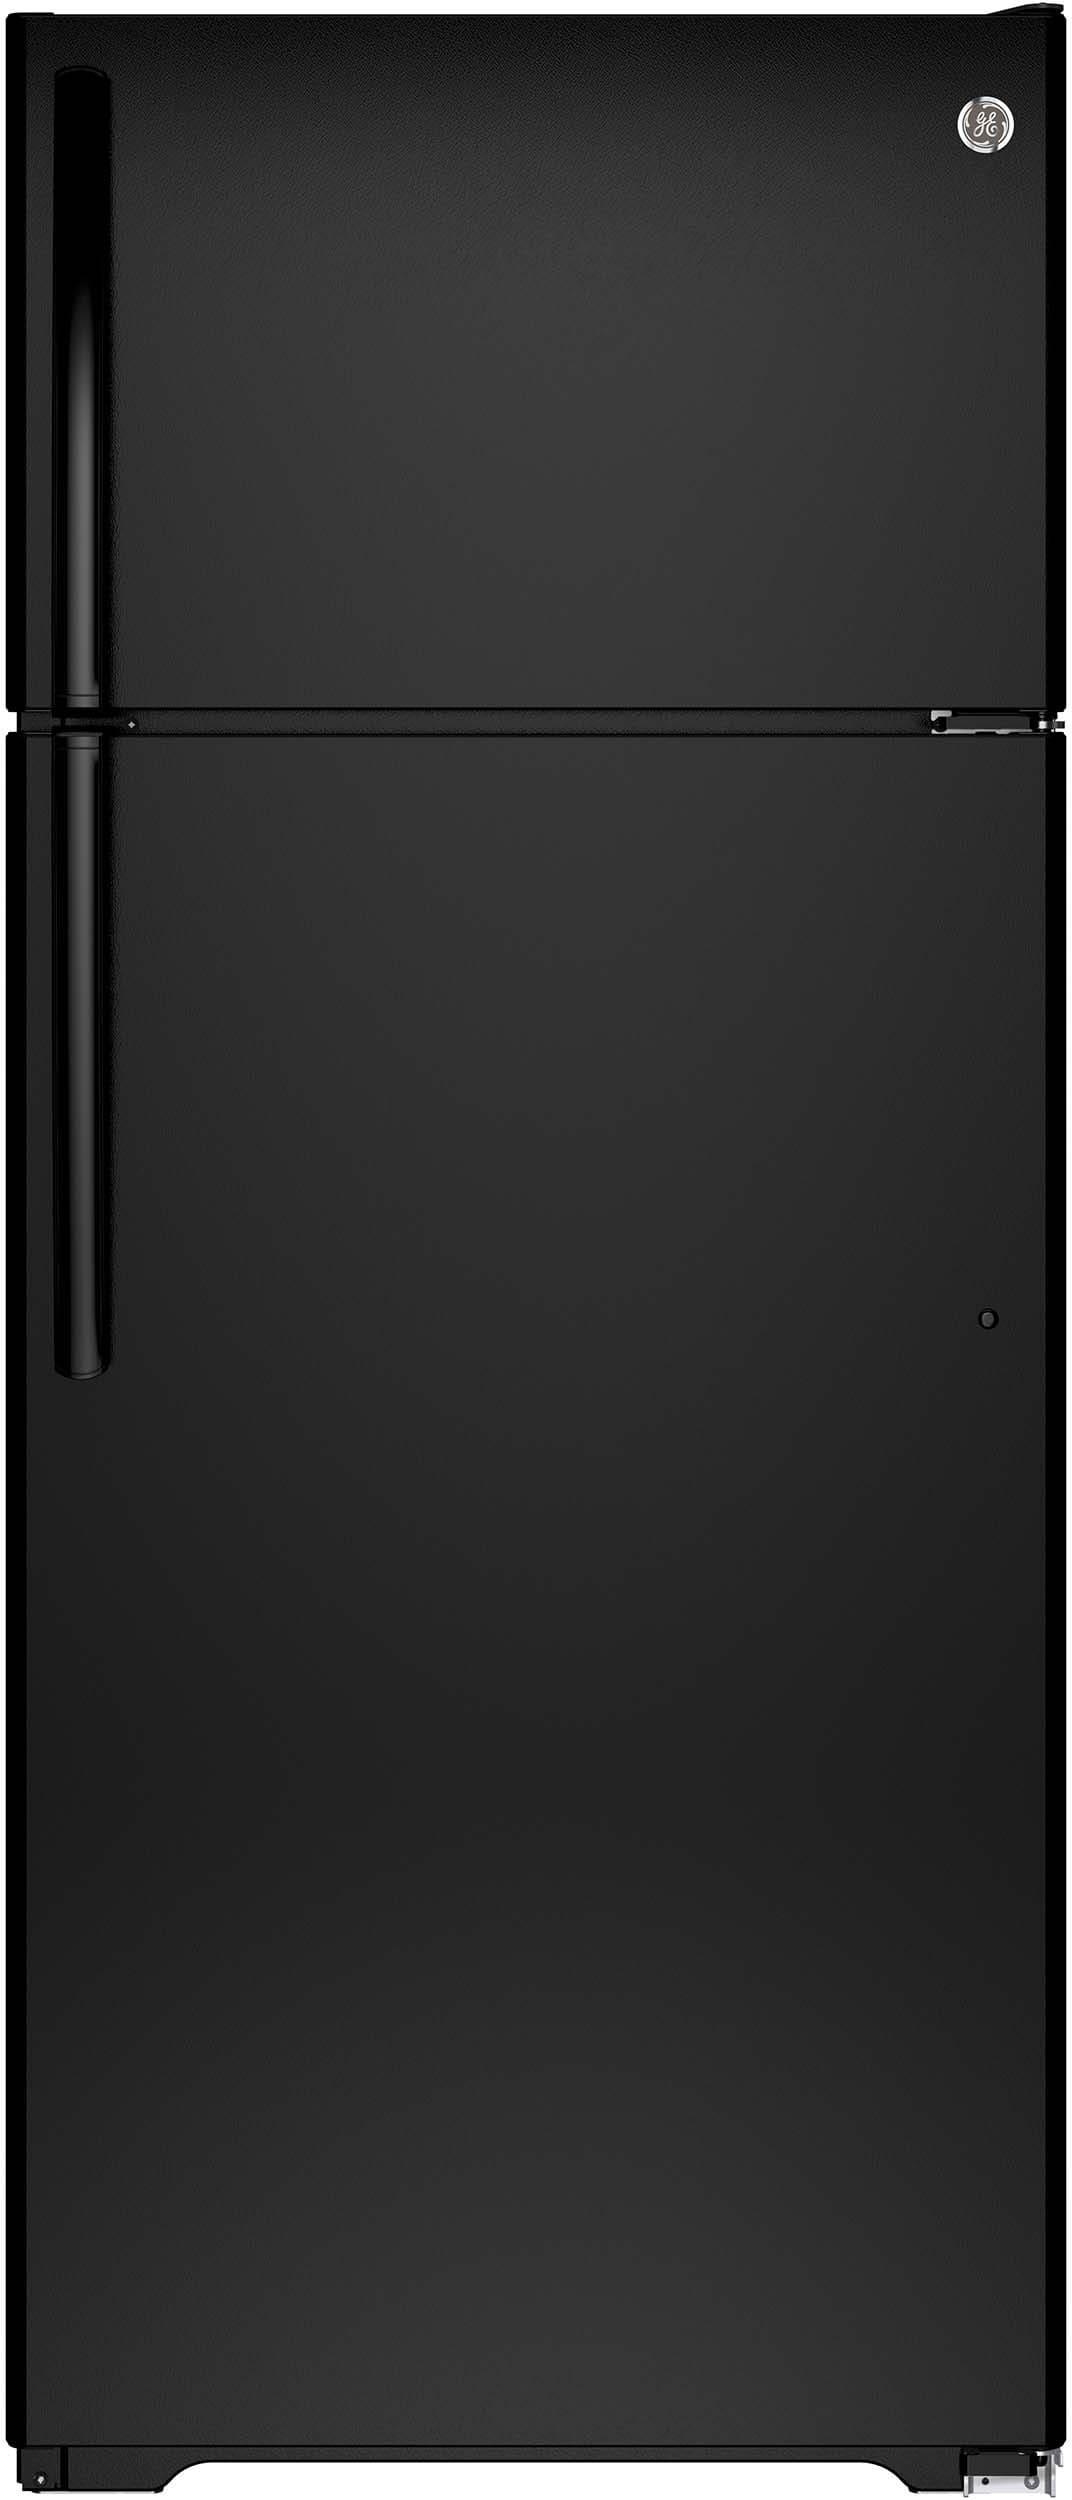 Ge Gte18gthbb 28 Inch Top Freezer Refrigerator With 17 5